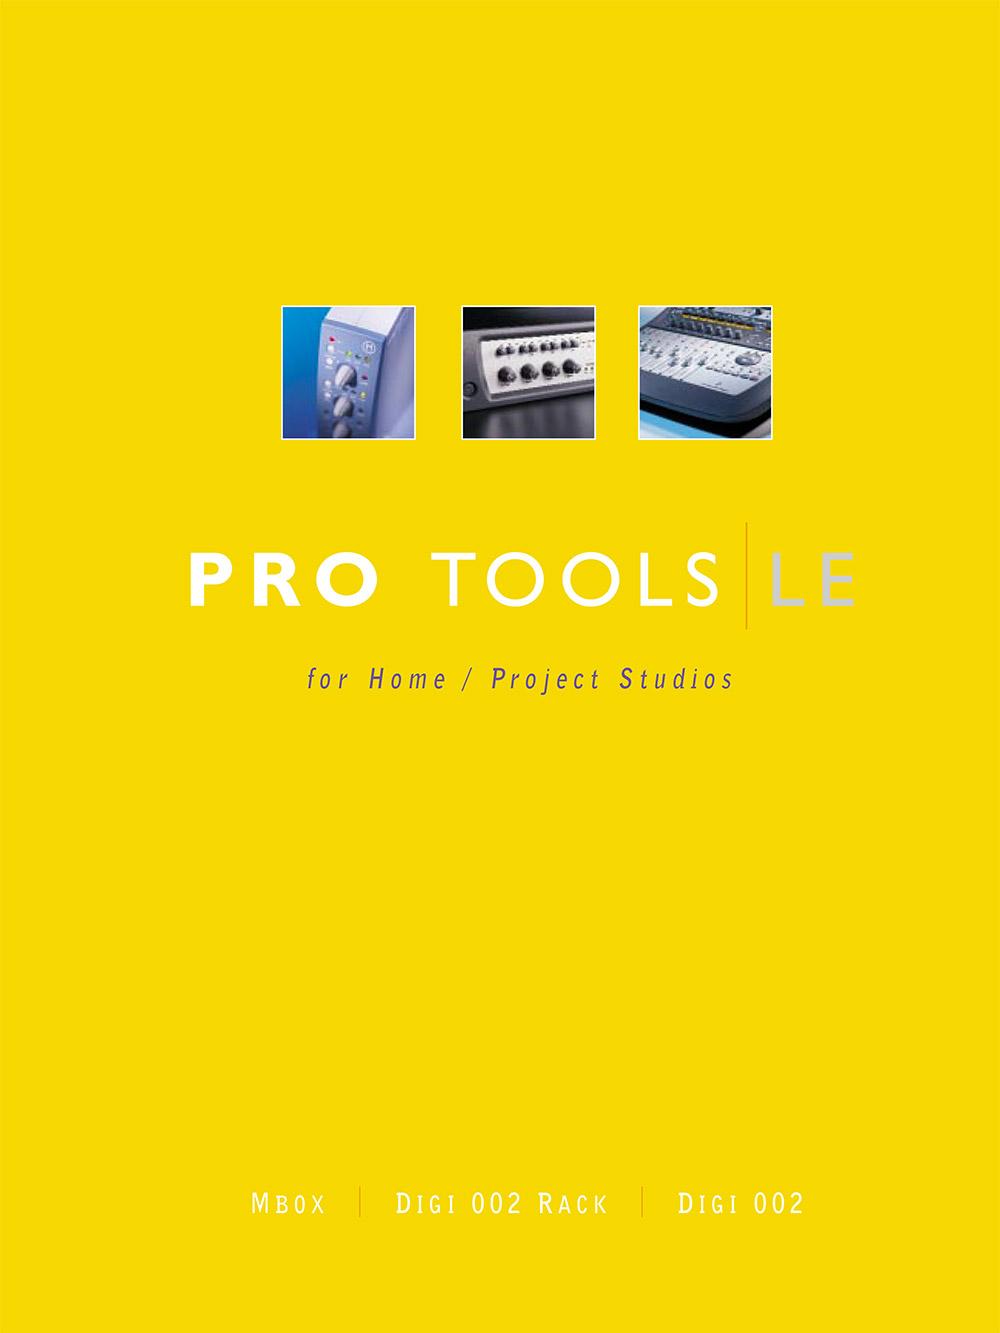 Boe Gatiss: Pro Tools LE brochure for Avid / Digidesign